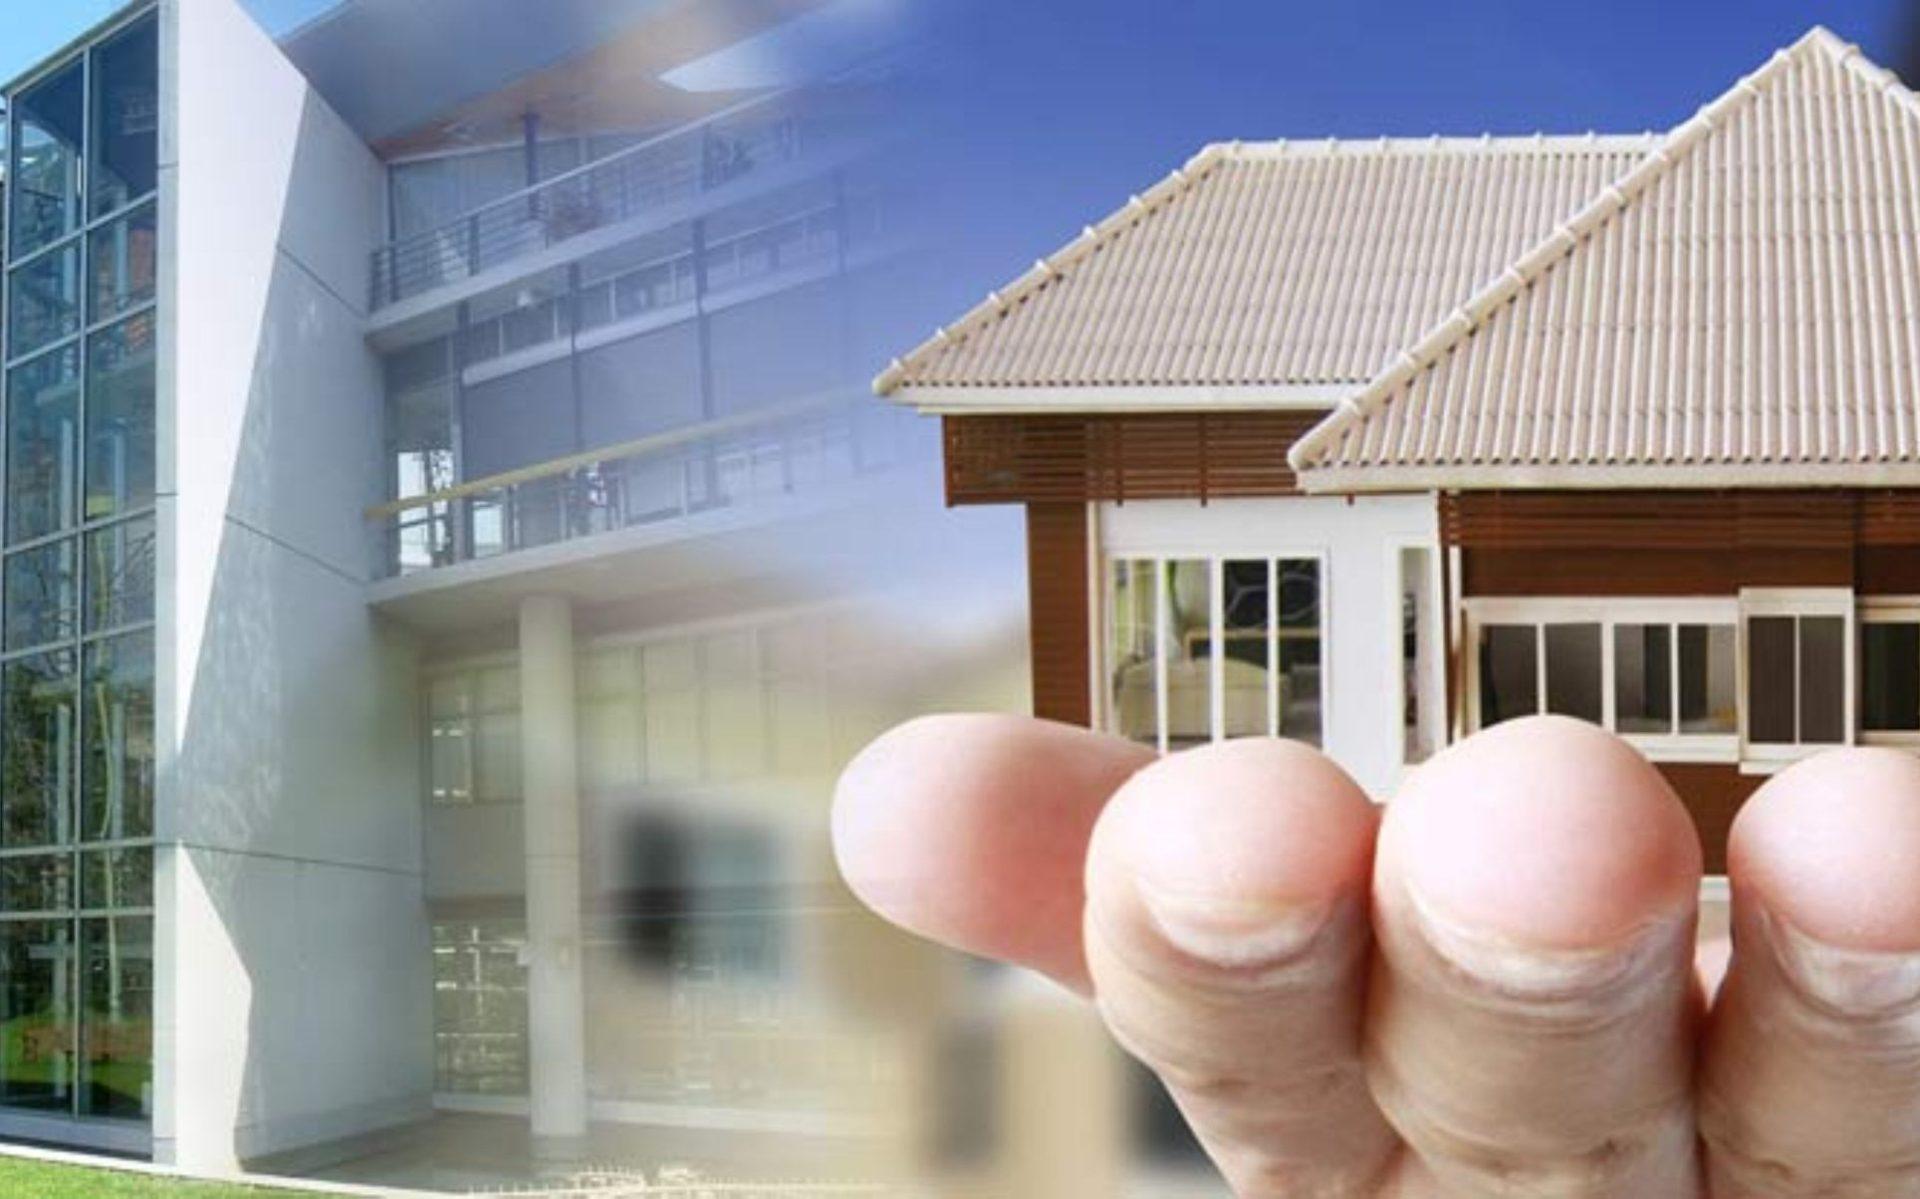 permuta-inmobiliaria-BBVA-trueque-compra-venta_recurso